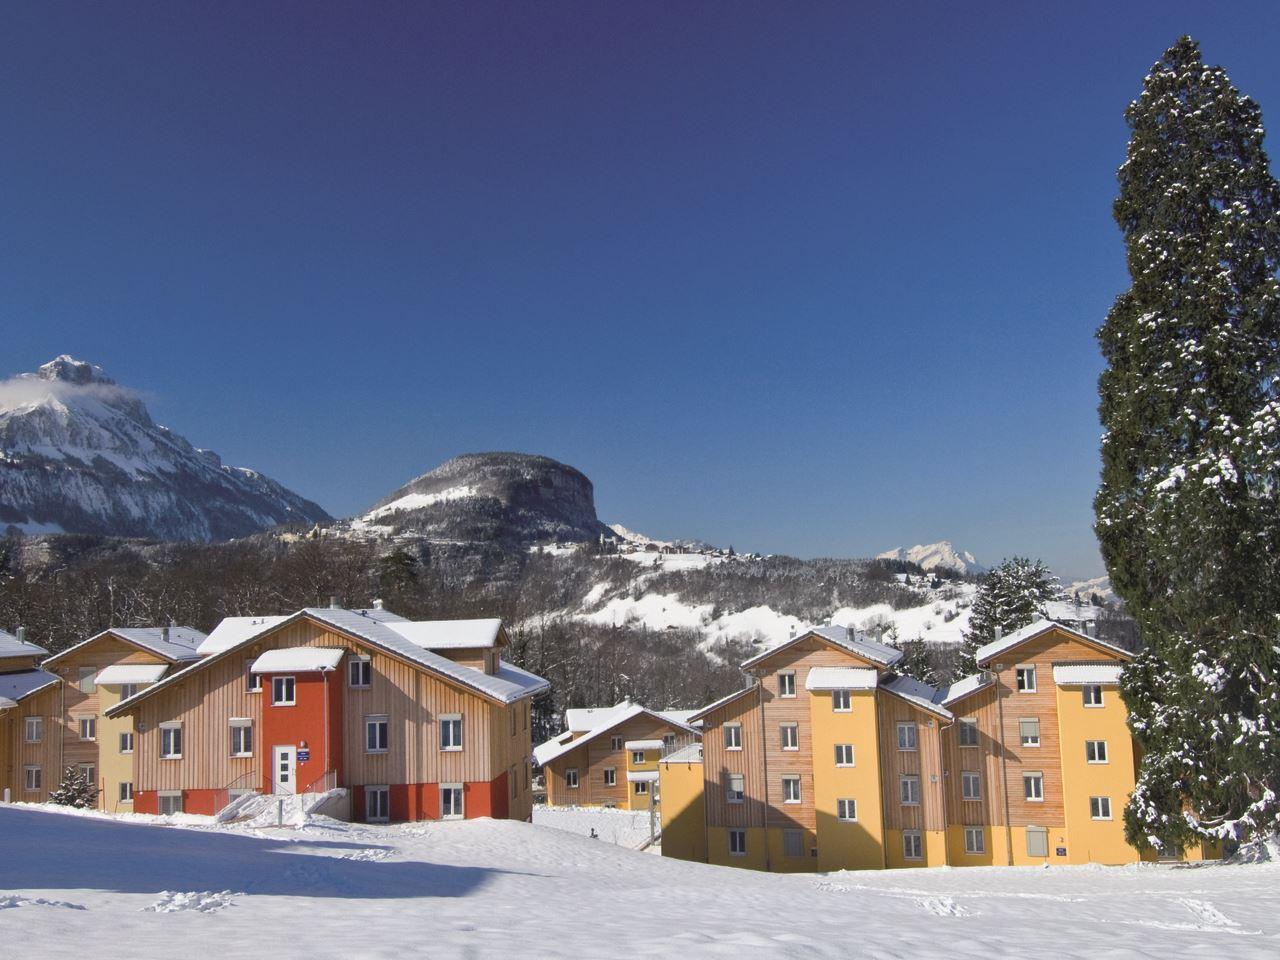 Appartement de vacances 6-Personen-Ferienwohnung im Ferienpark Landal Vierwaldstättersee - in den Bergen (355278), Morschach, Lac des Quatre-Cantons, Suisse Centrale, Suisse, image 2